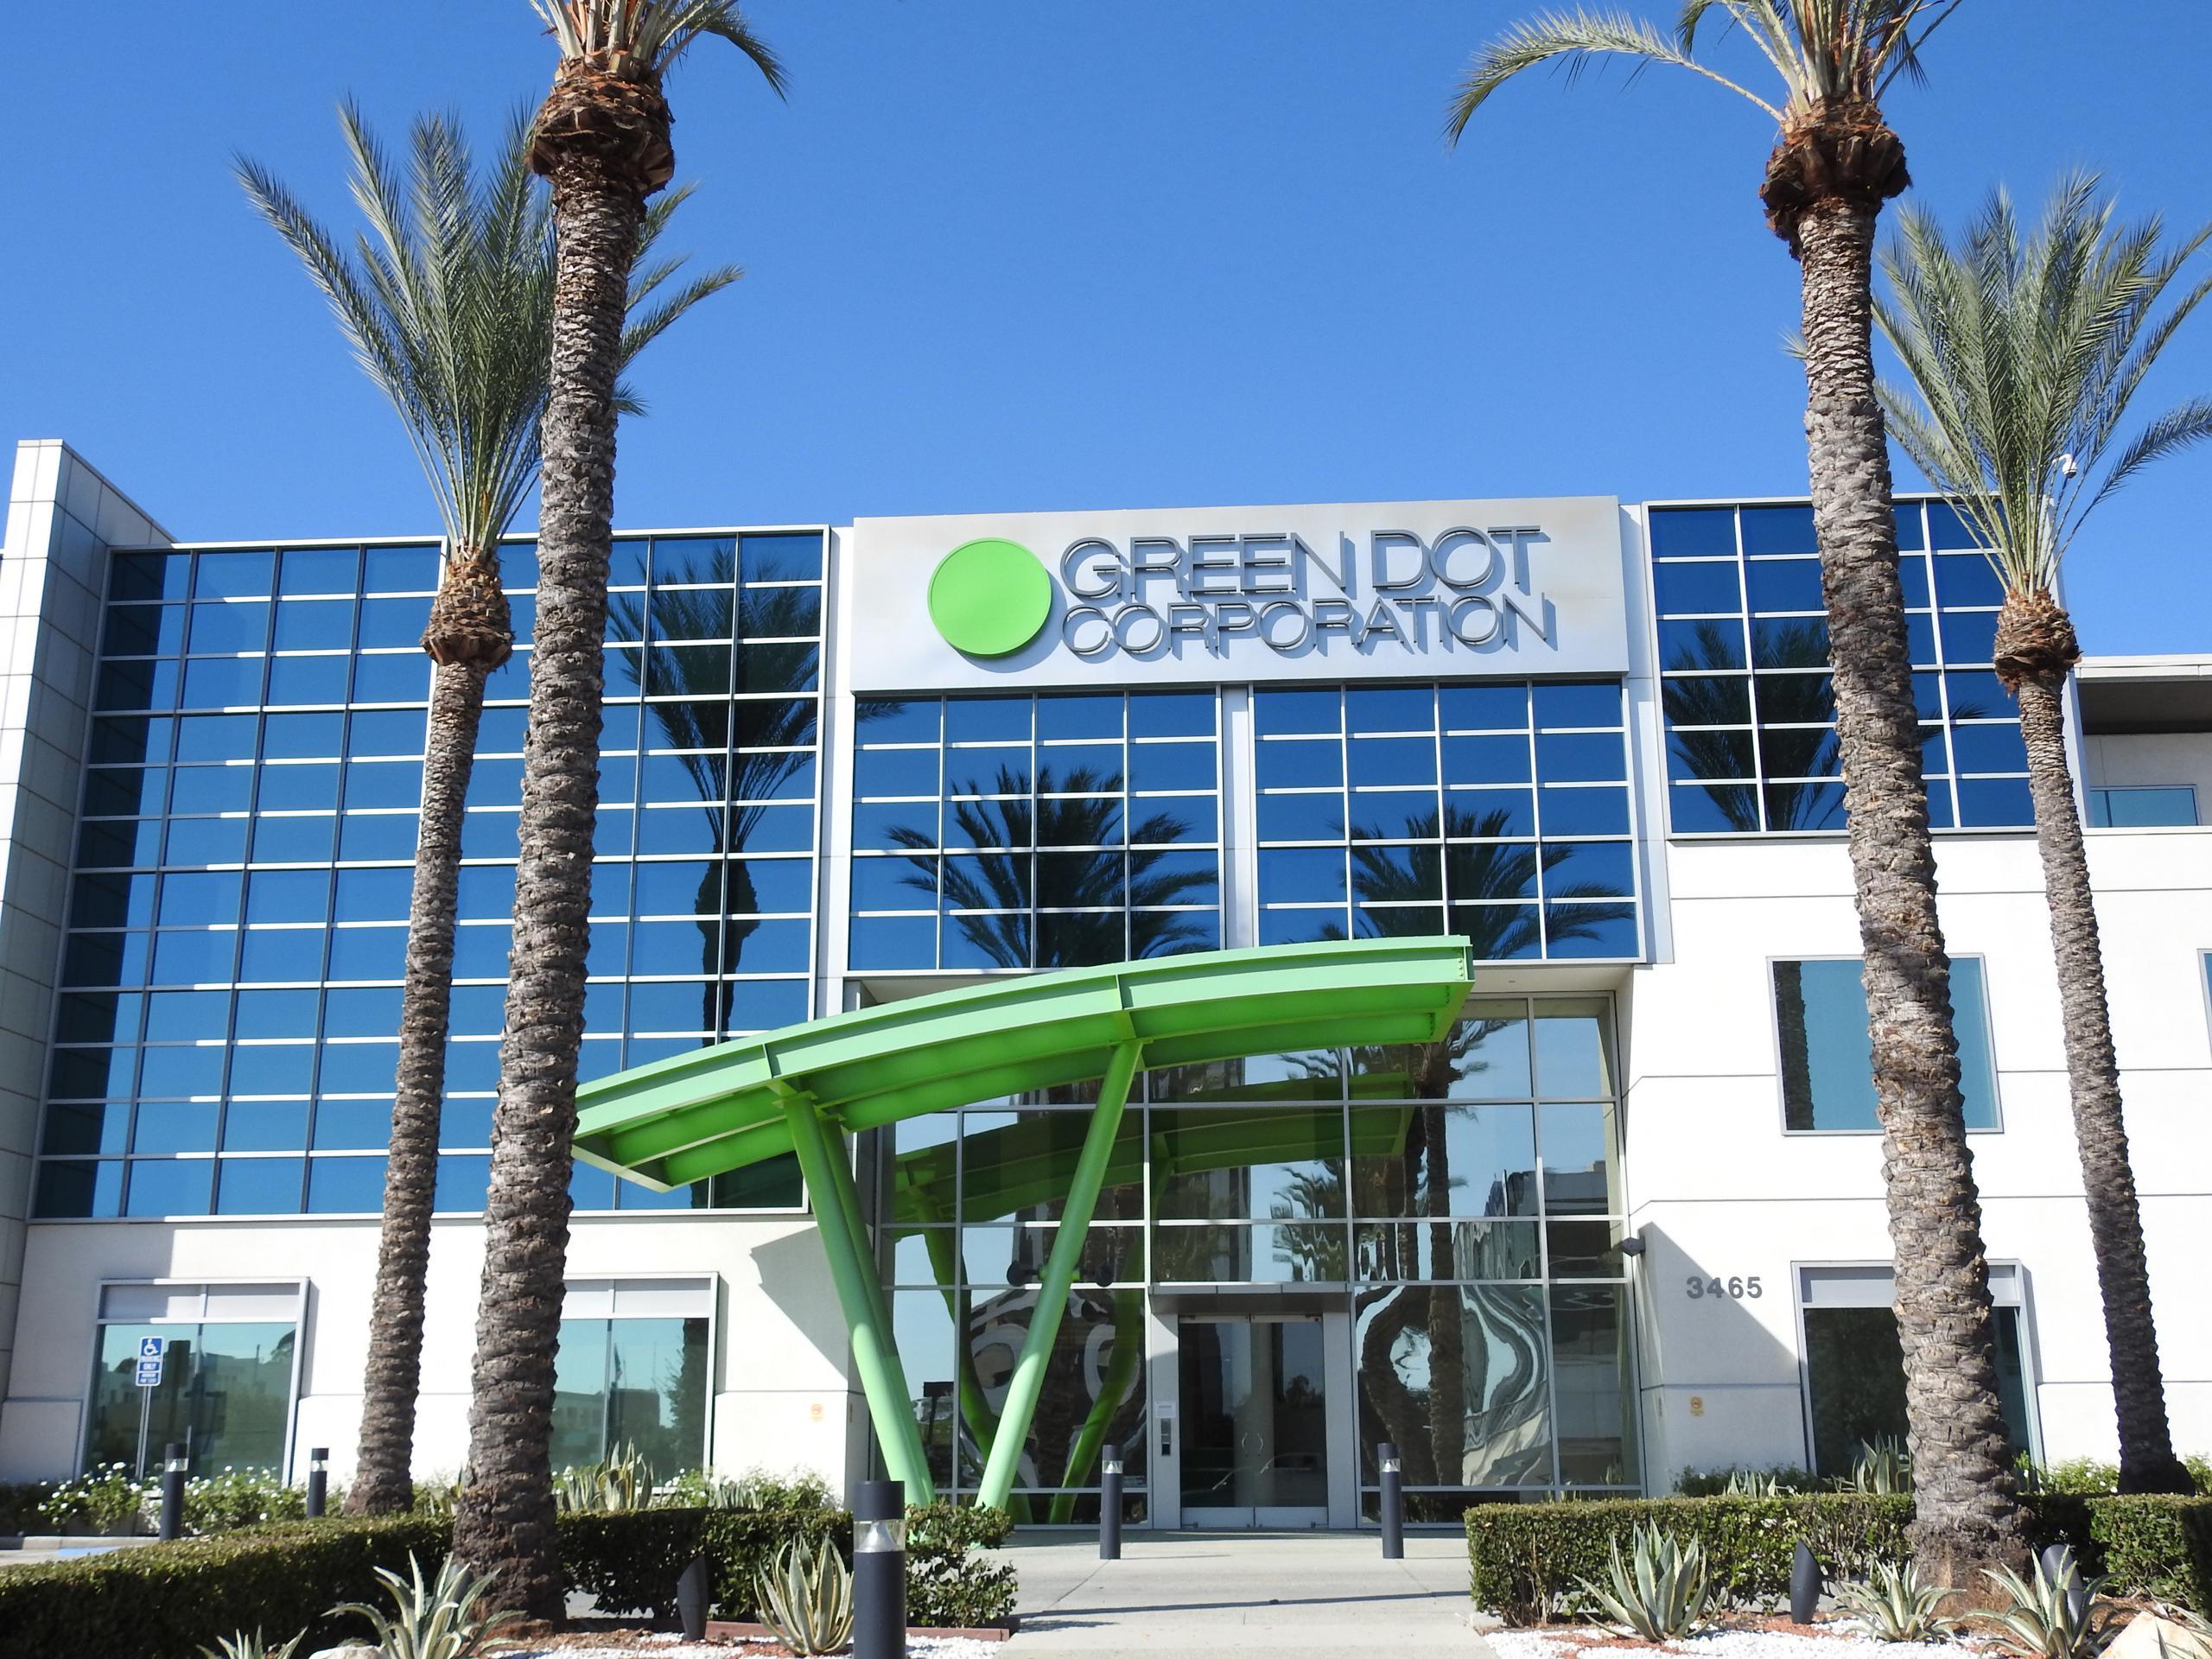 Green Dot's corporate headquarters in Pasadena, California.